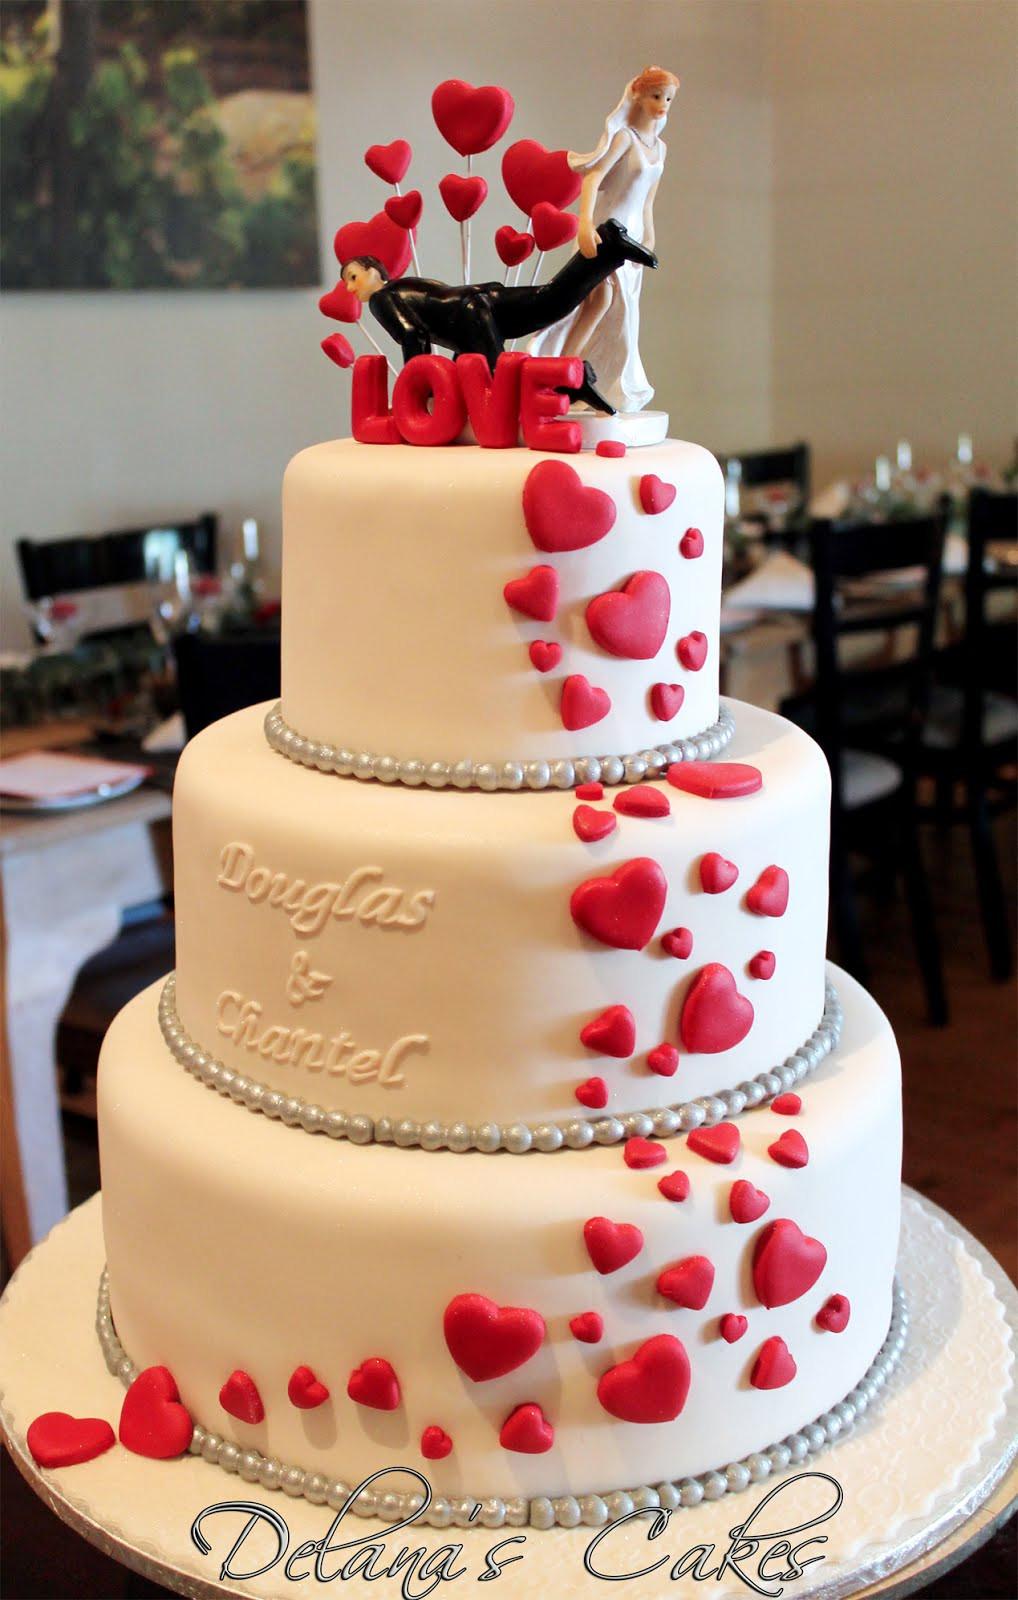 Wedding Cakes With Hearts  Delana s Cakes Hearts Wedding Cake